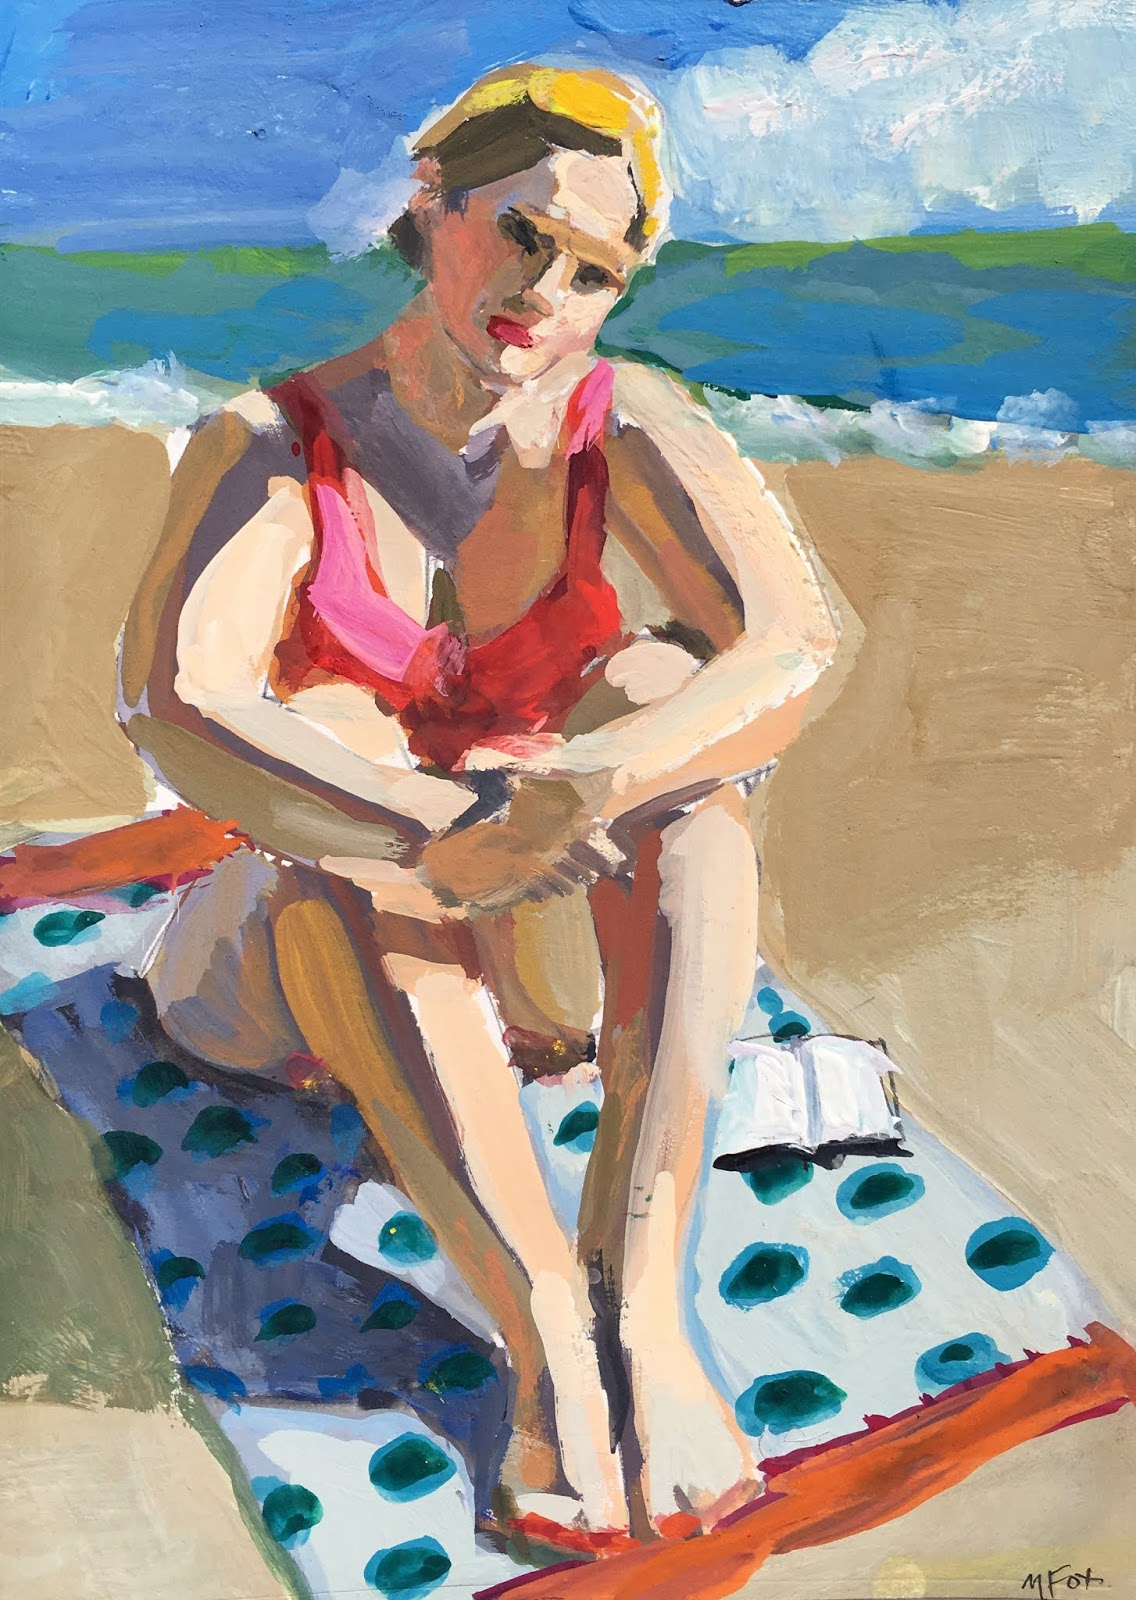 Curvy Woman At Beach Summer Book Reading By Ocean